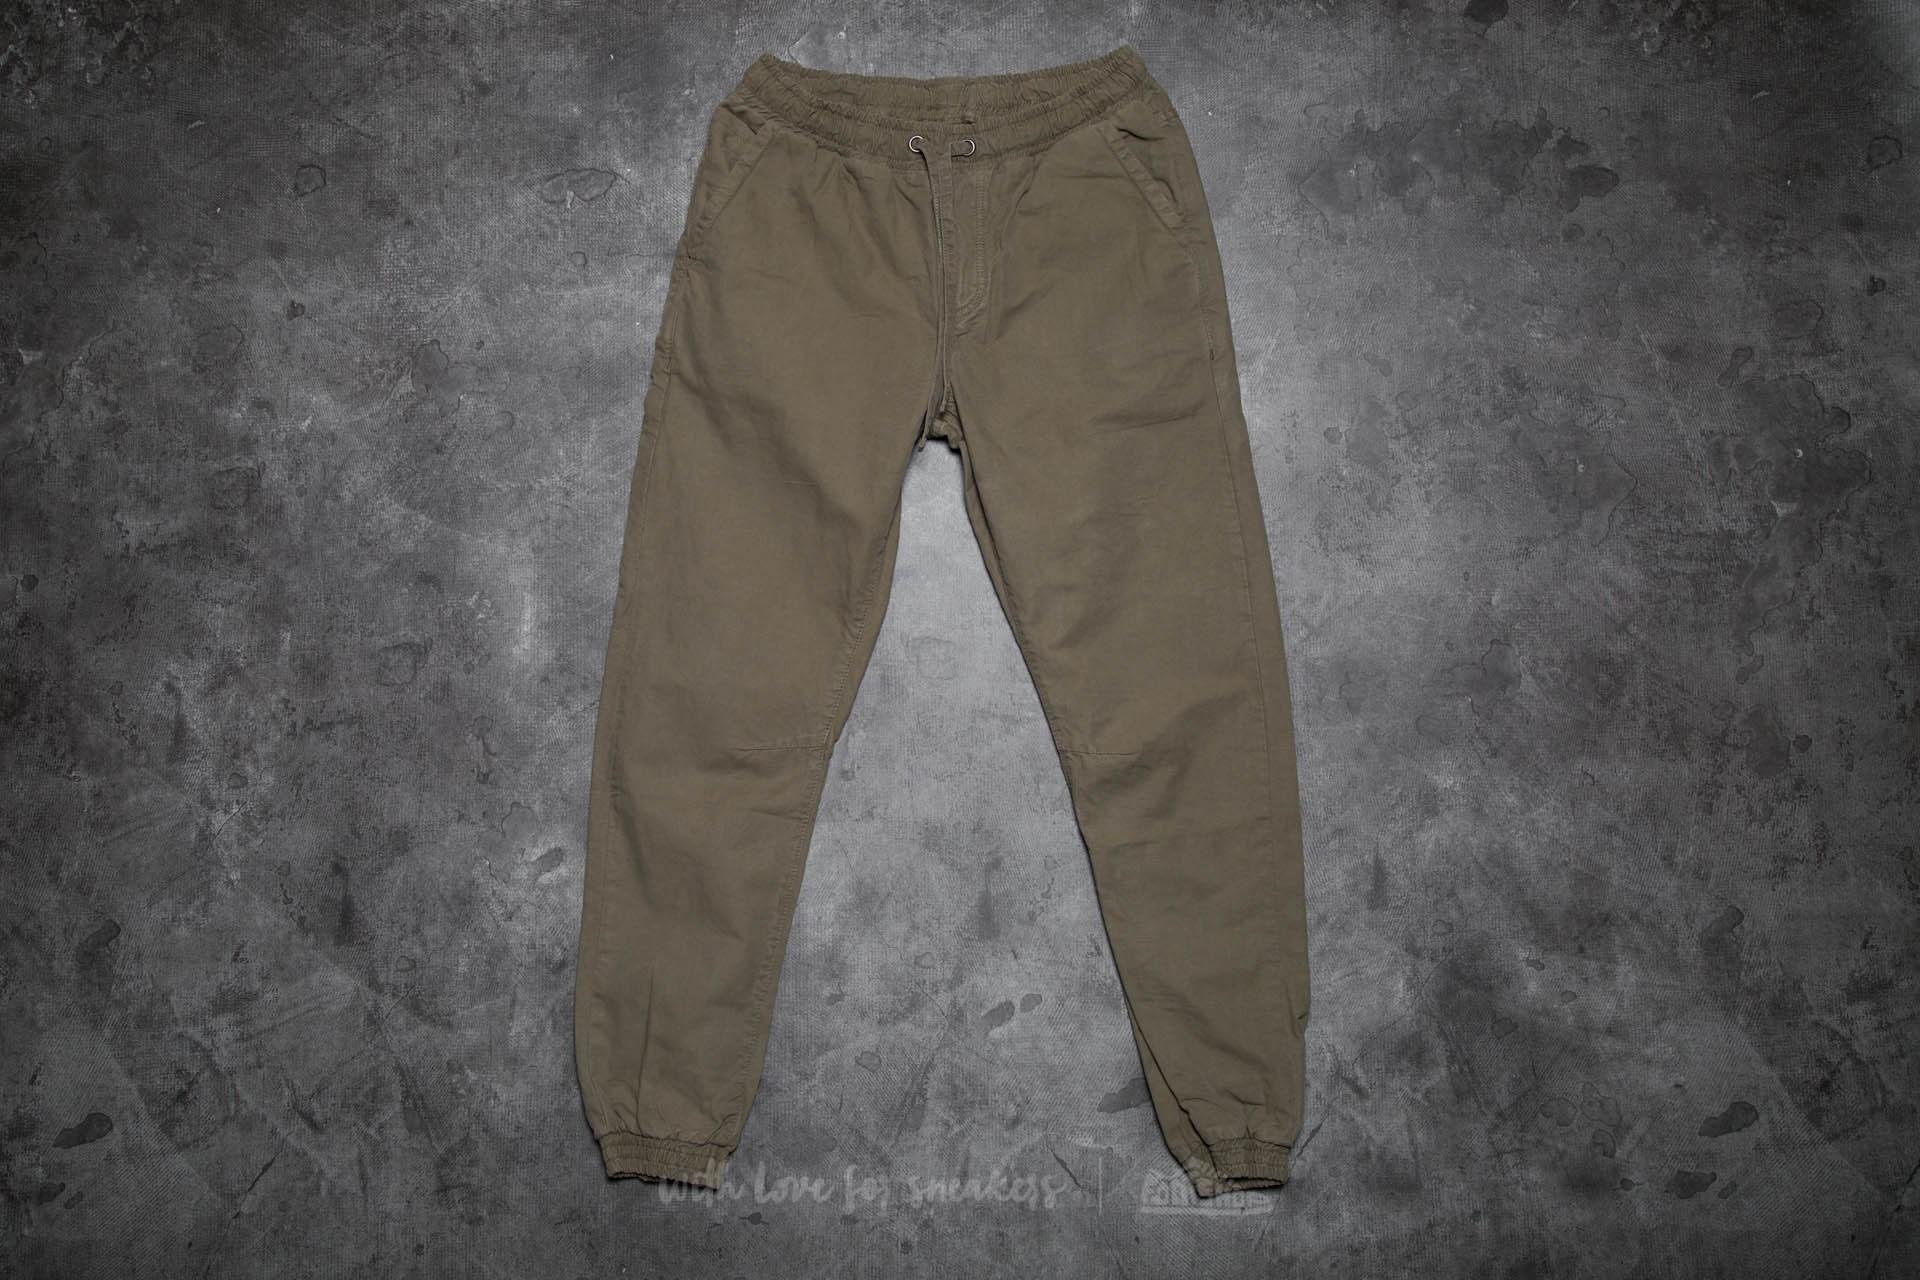 Urban Classics Washed Canvas Jogging Pants Olive